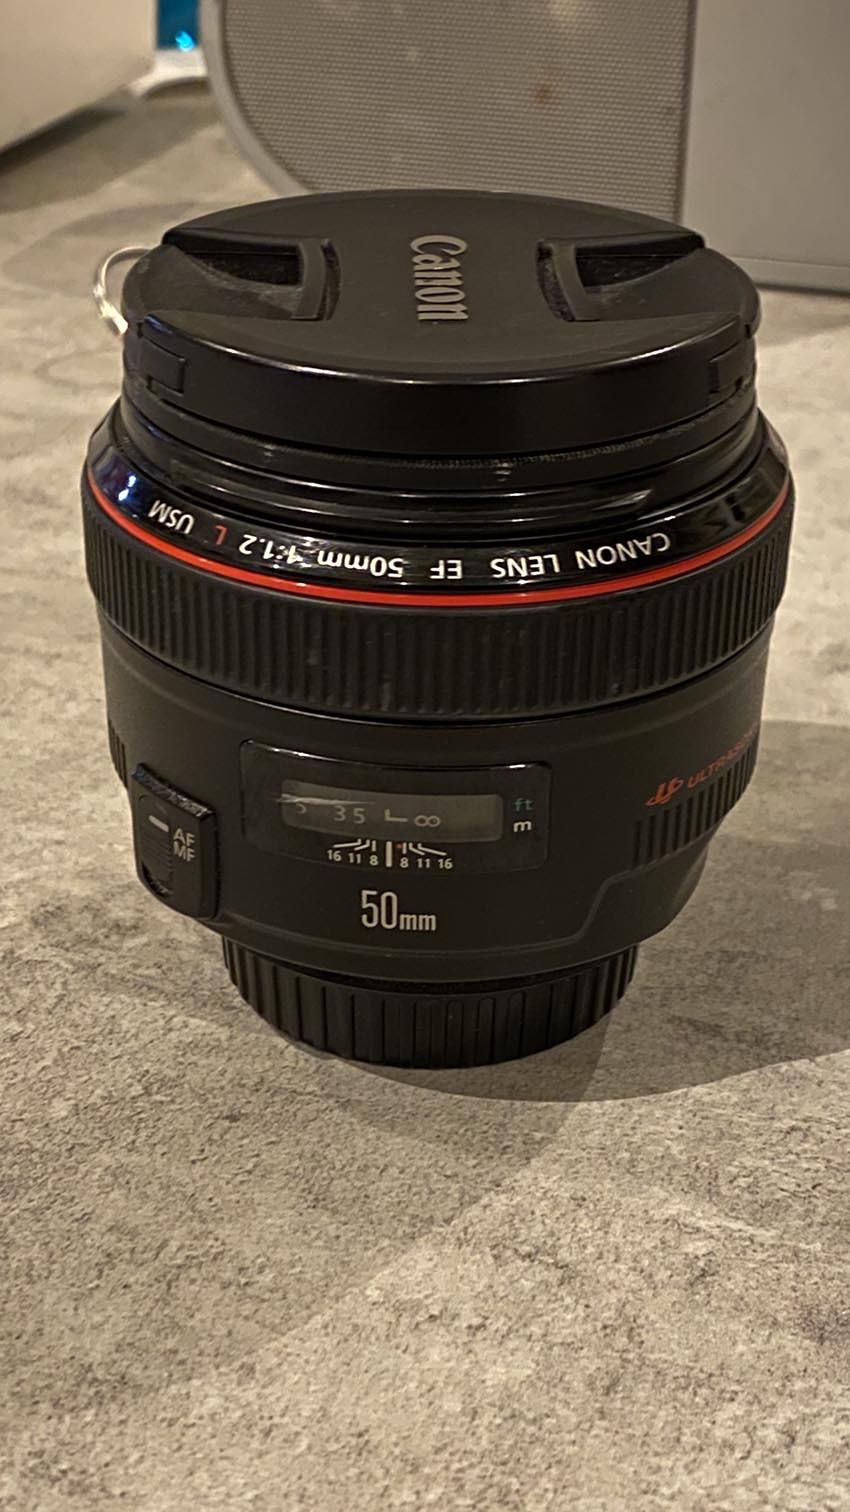 Vends objectif Canon 50mm F1.2 L USM